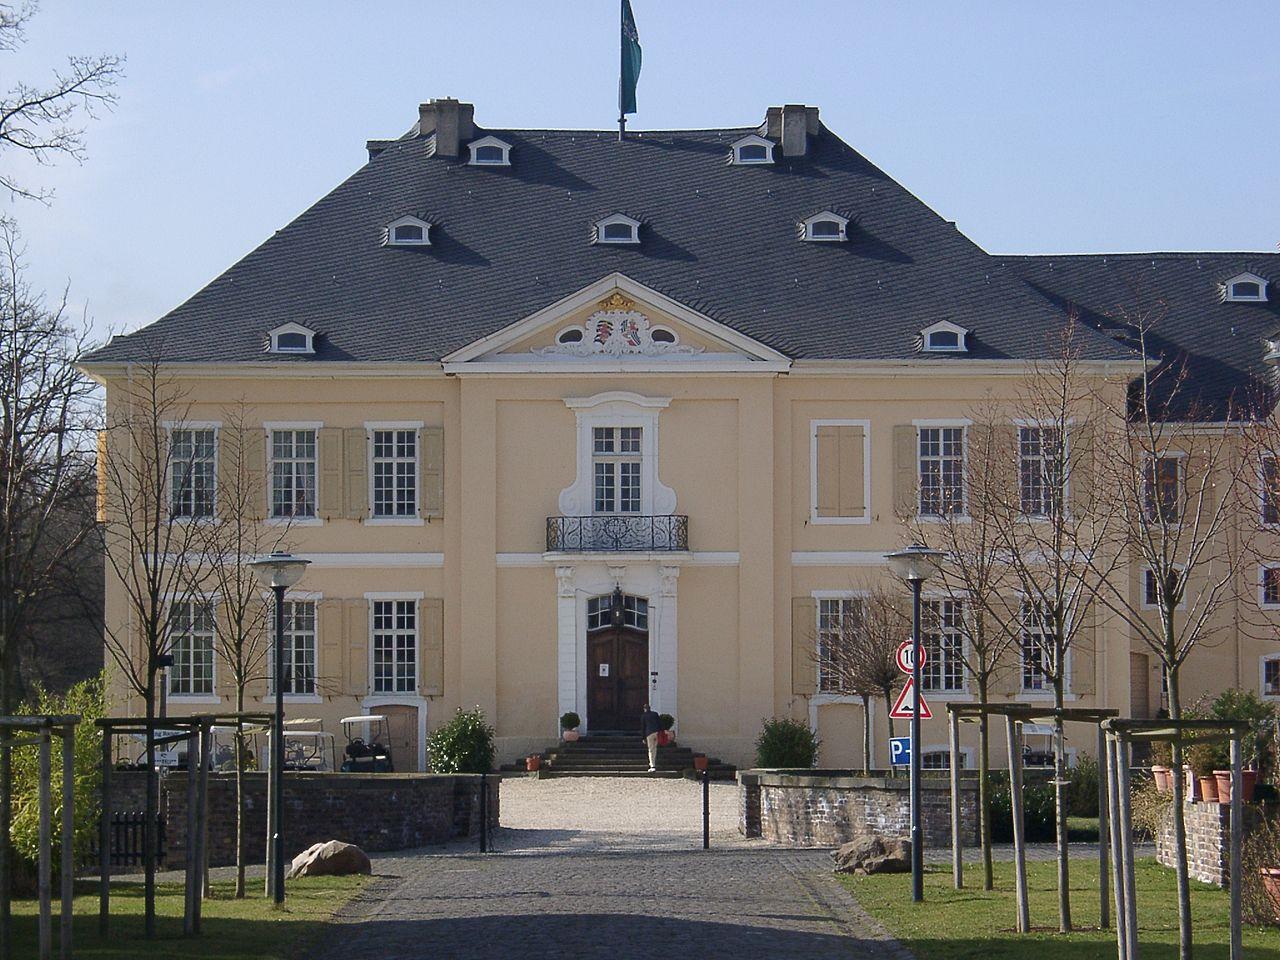 Bild Schloss Miel Swisttal